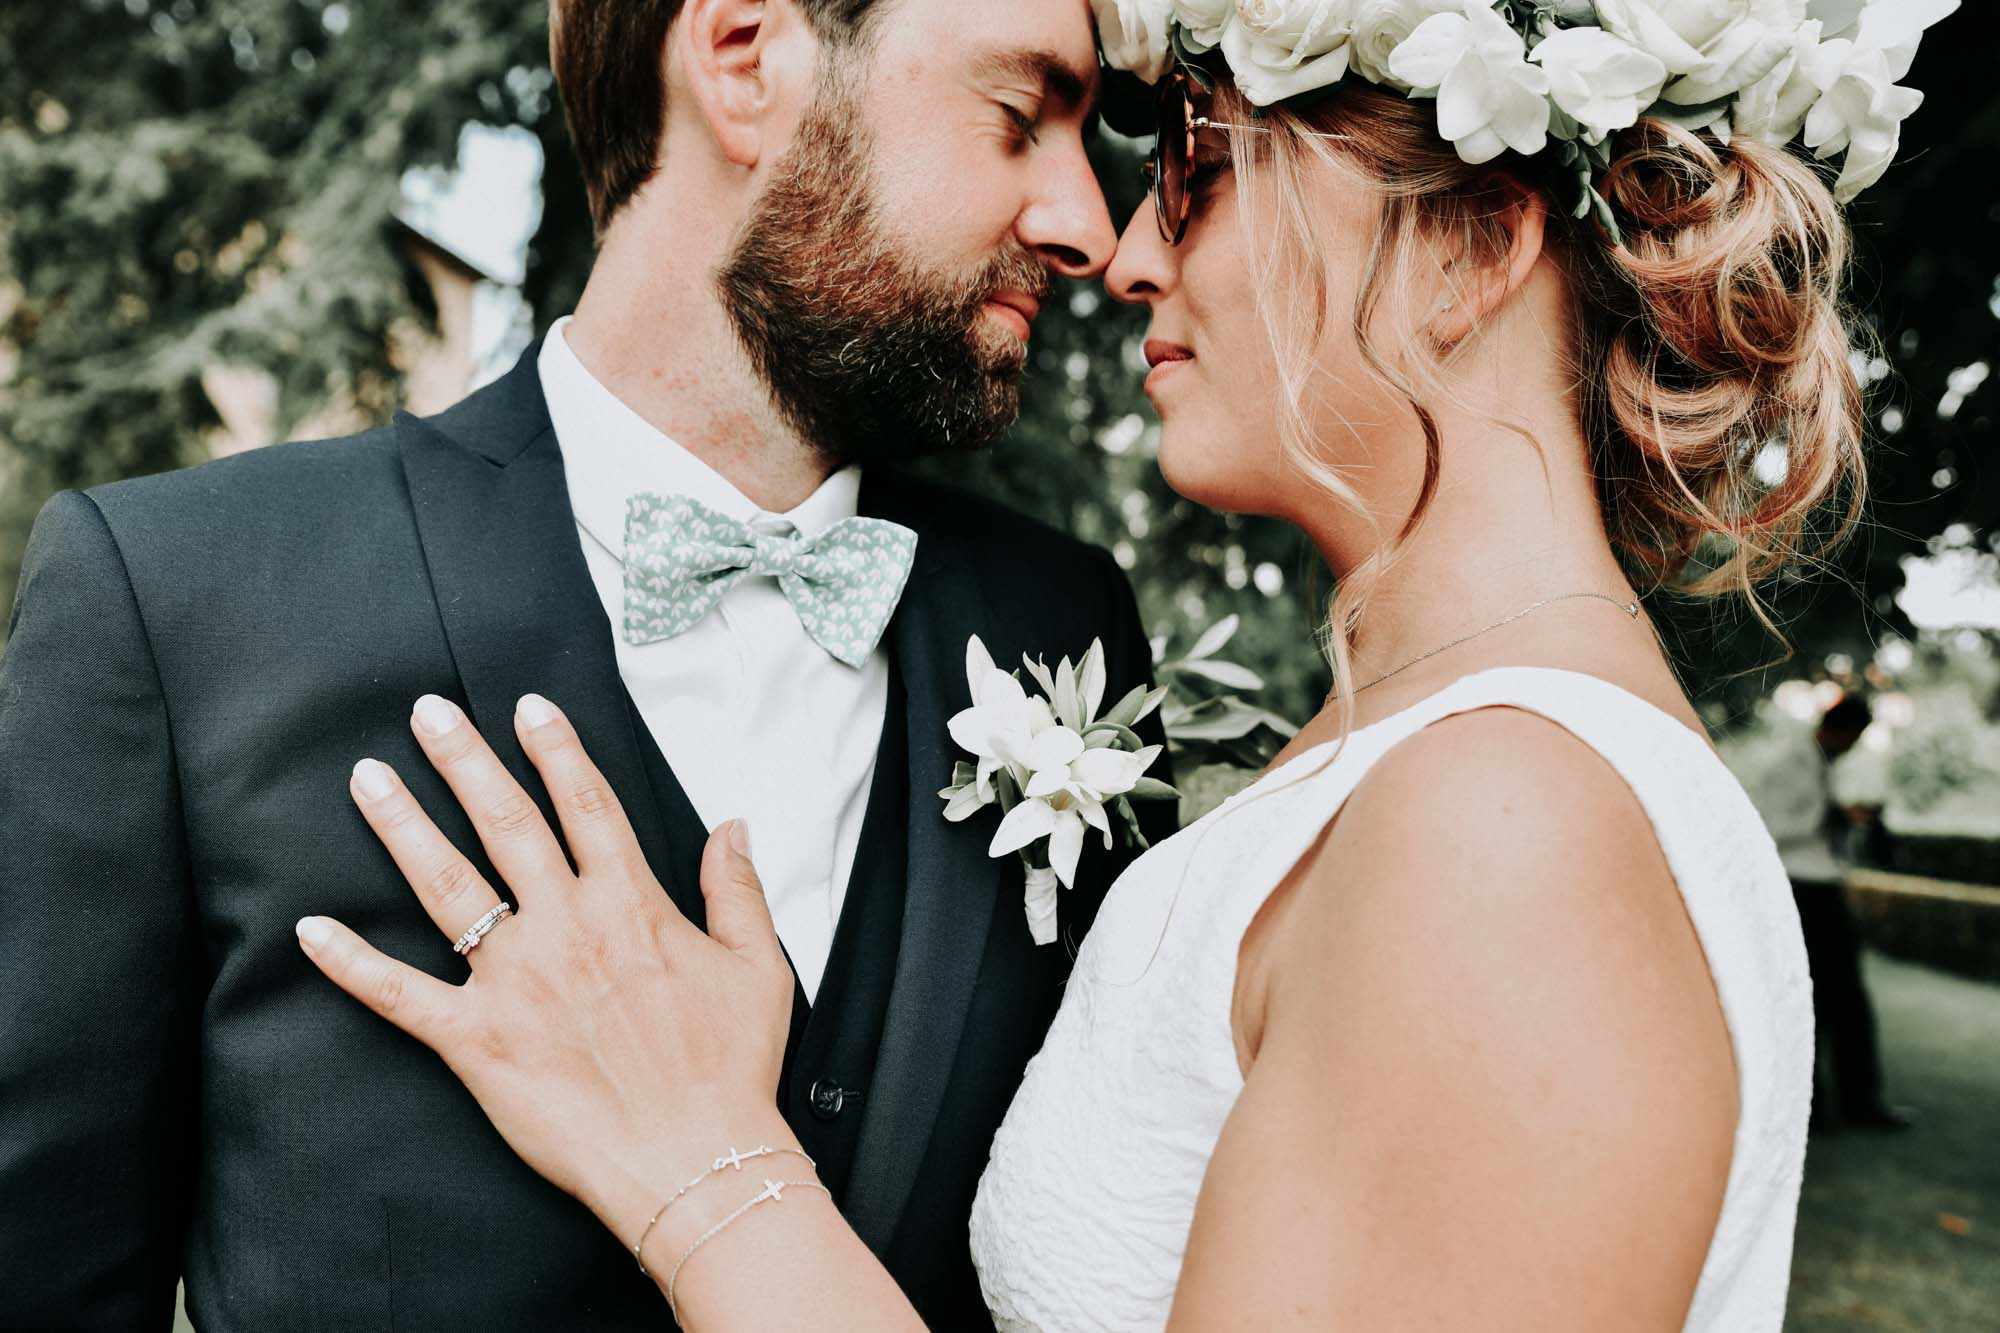 2018-07-21 - LD8_0233 - photographe mariage lyon - laurie diaz - www.lauriediazweeding.com.jpg